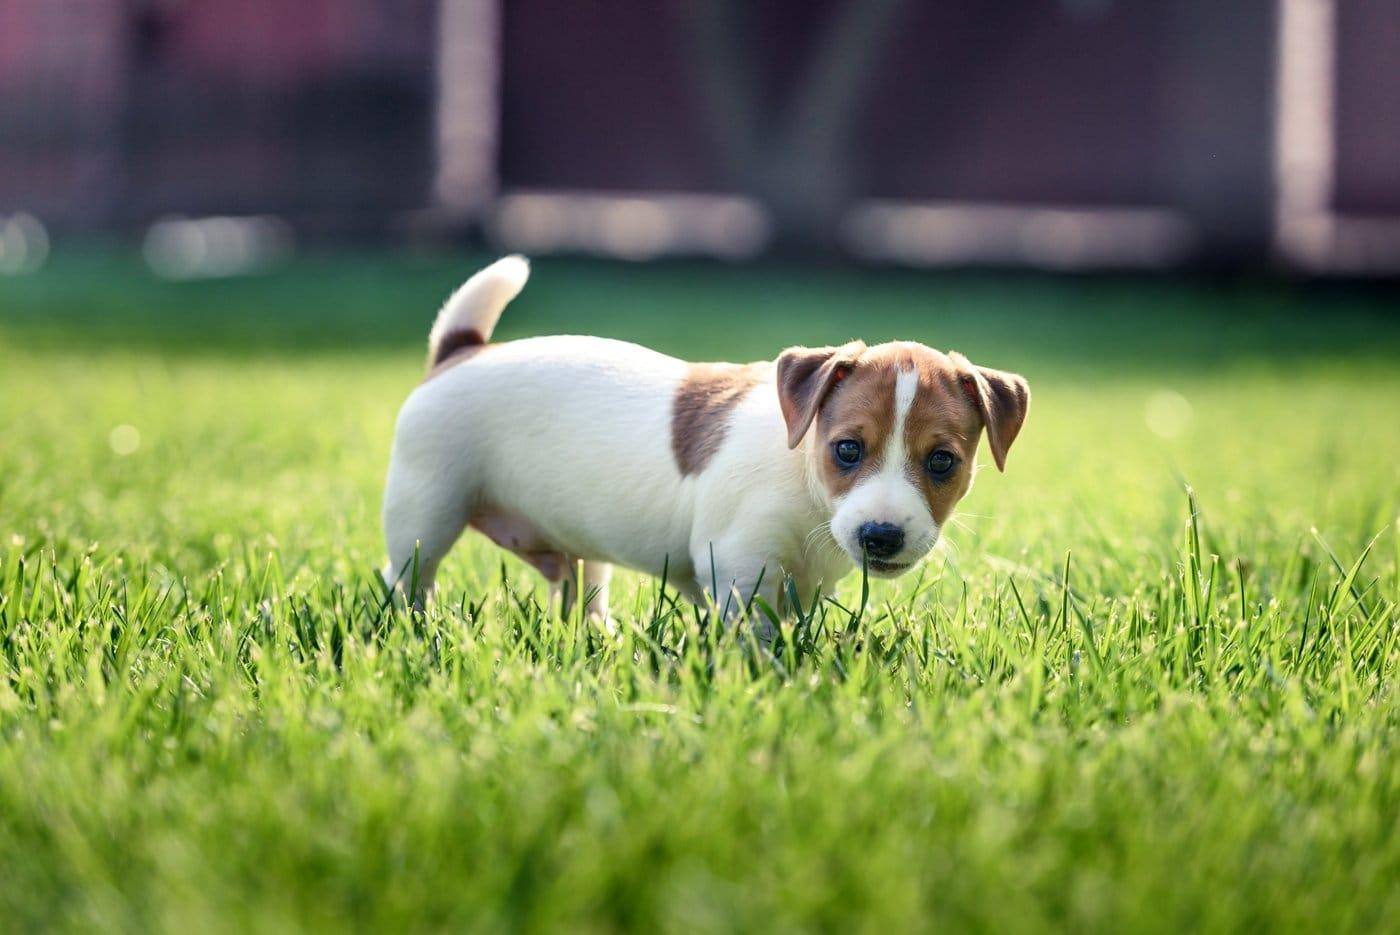 Cute puppy on lawn grass